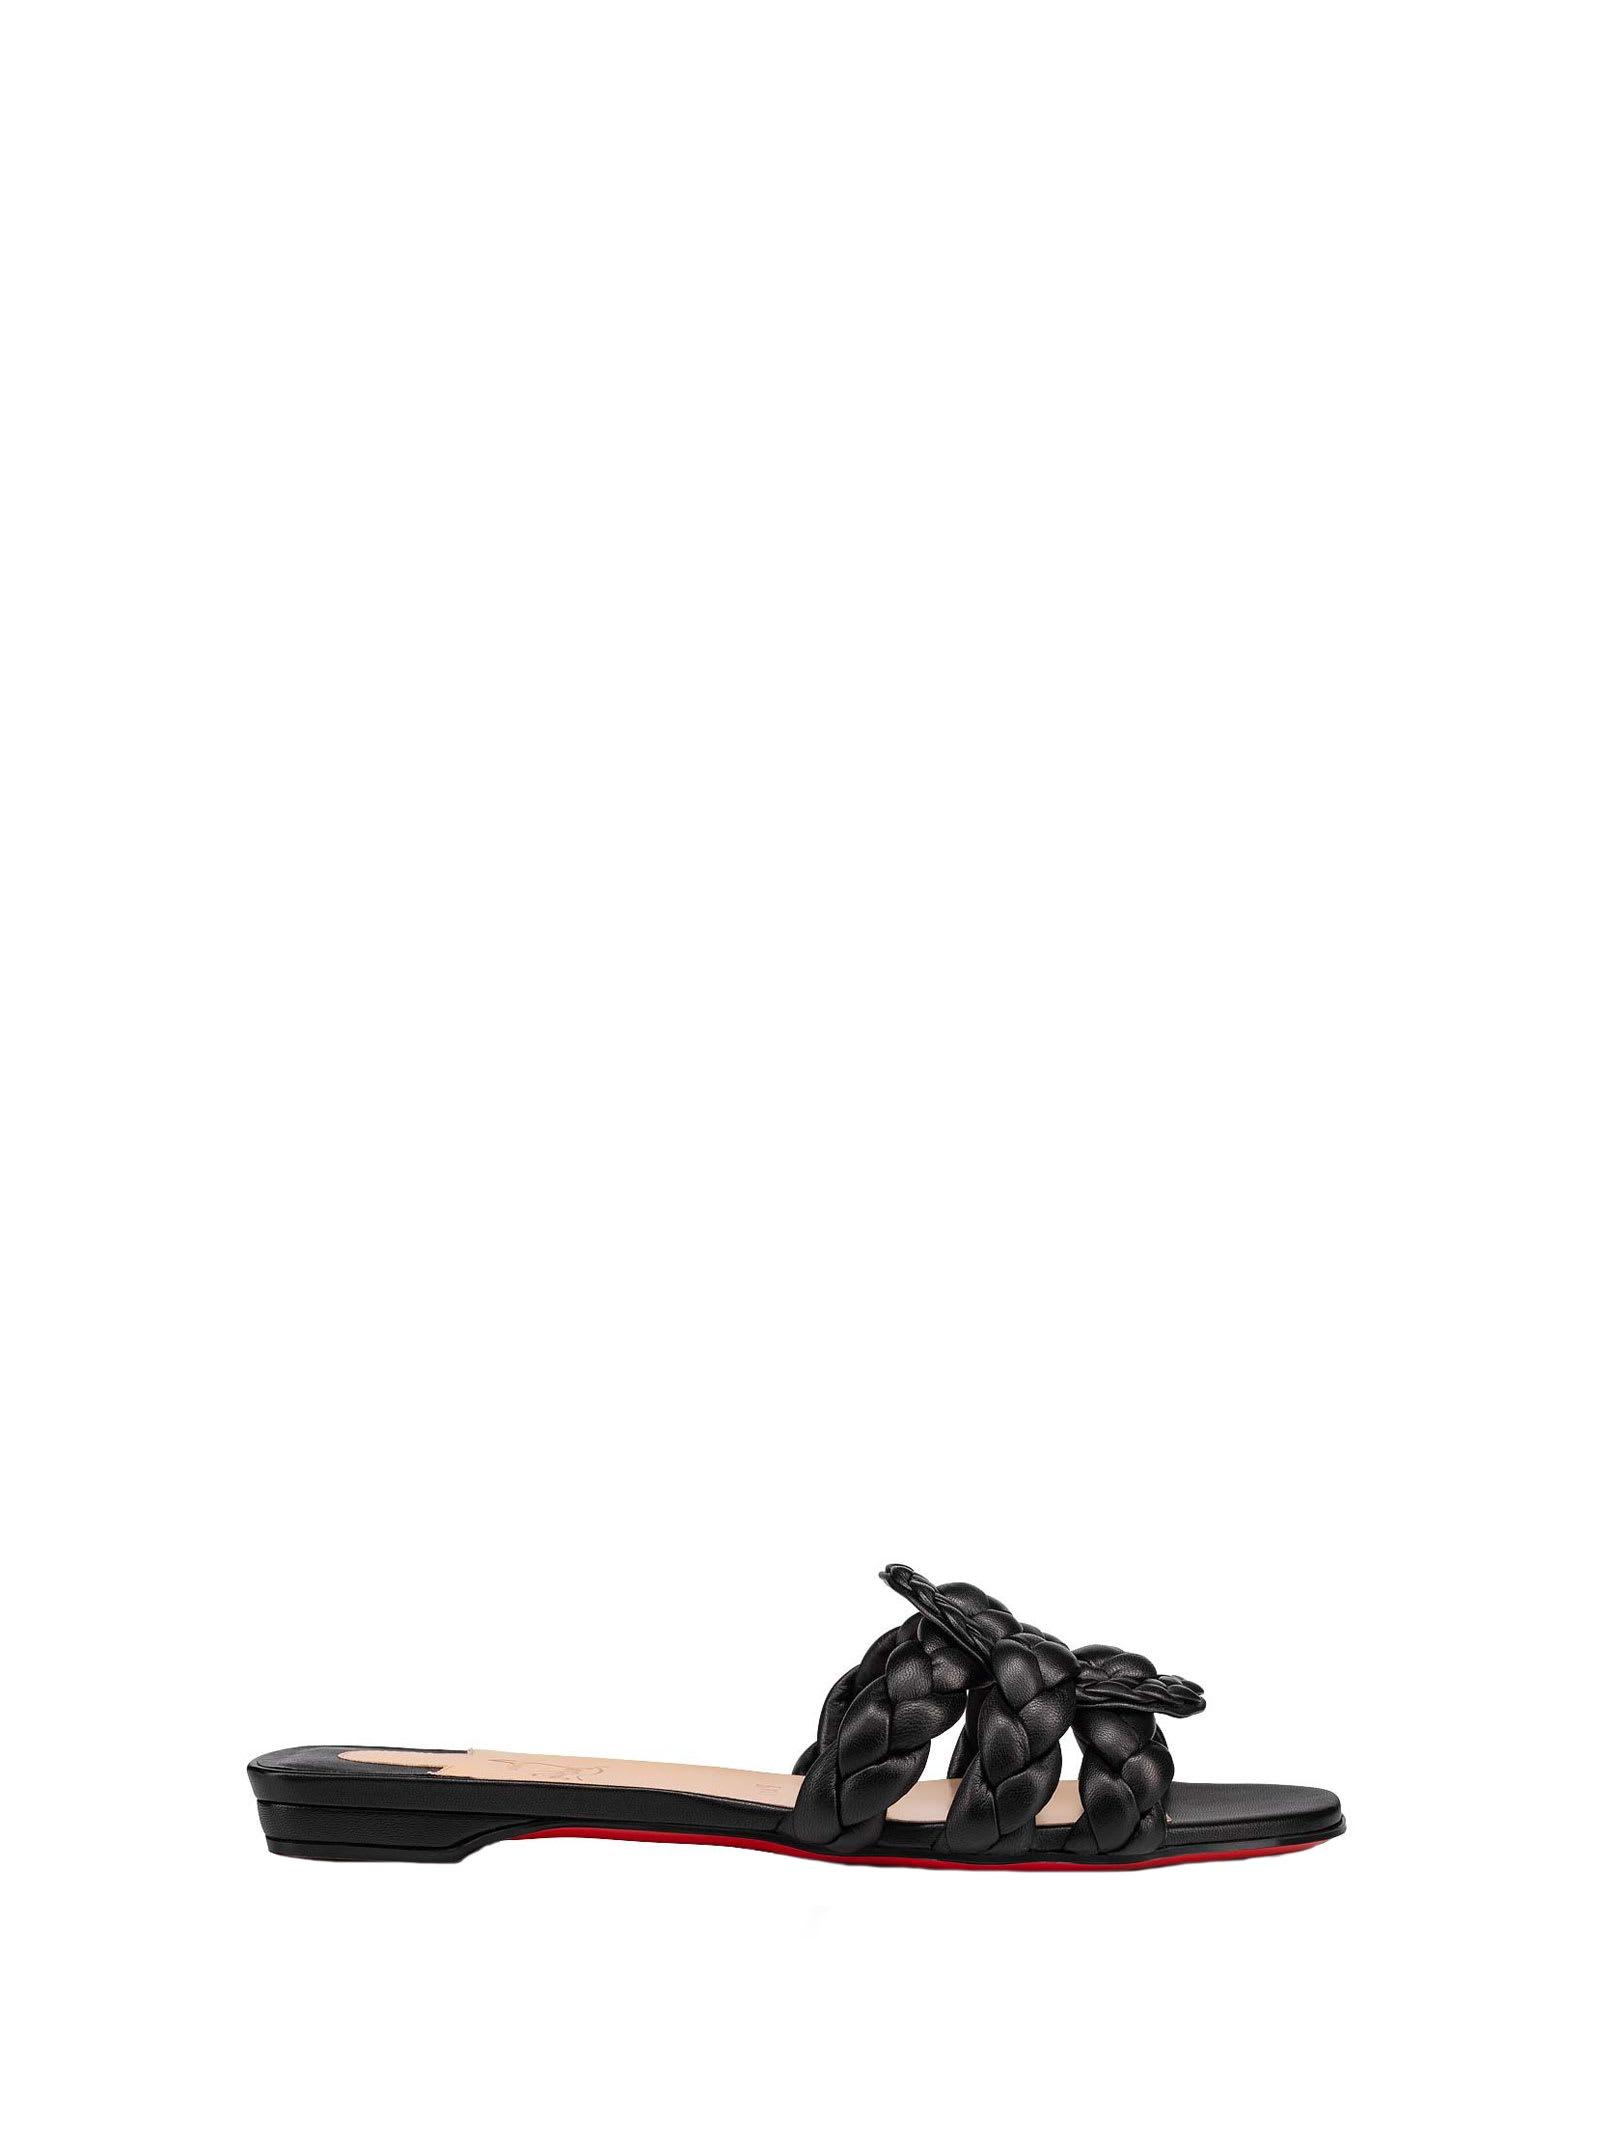 Buy Christian Louboutin Christian Louboutin Marmela Flat Shoe online, shop Christian Louboutin shoes with free shipping